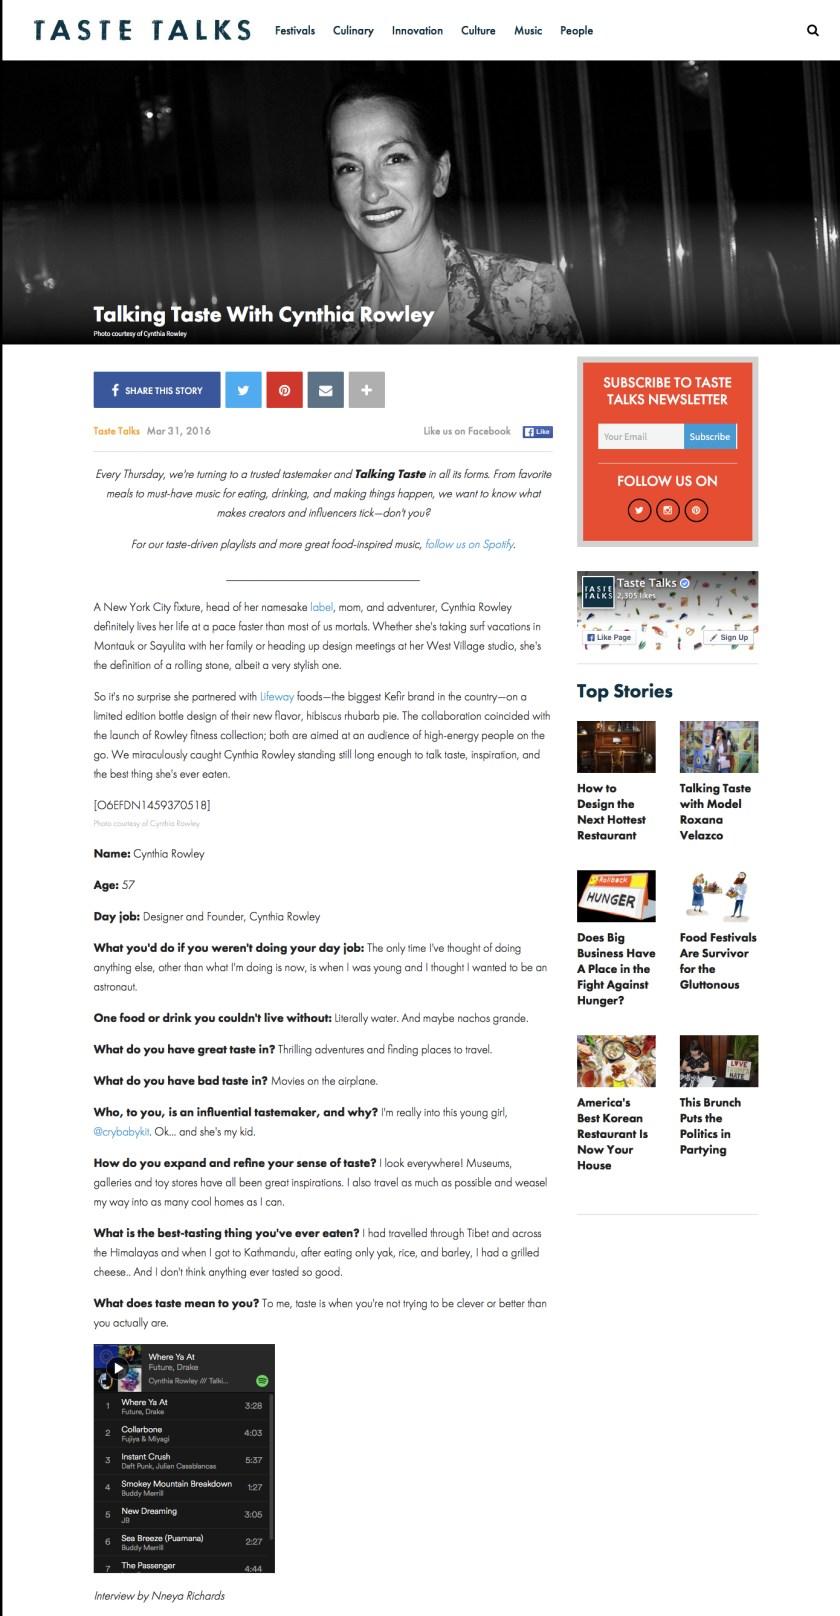 TasteTalks.com - 3.31.16 - Talking Taste w: Cynthia Rowley